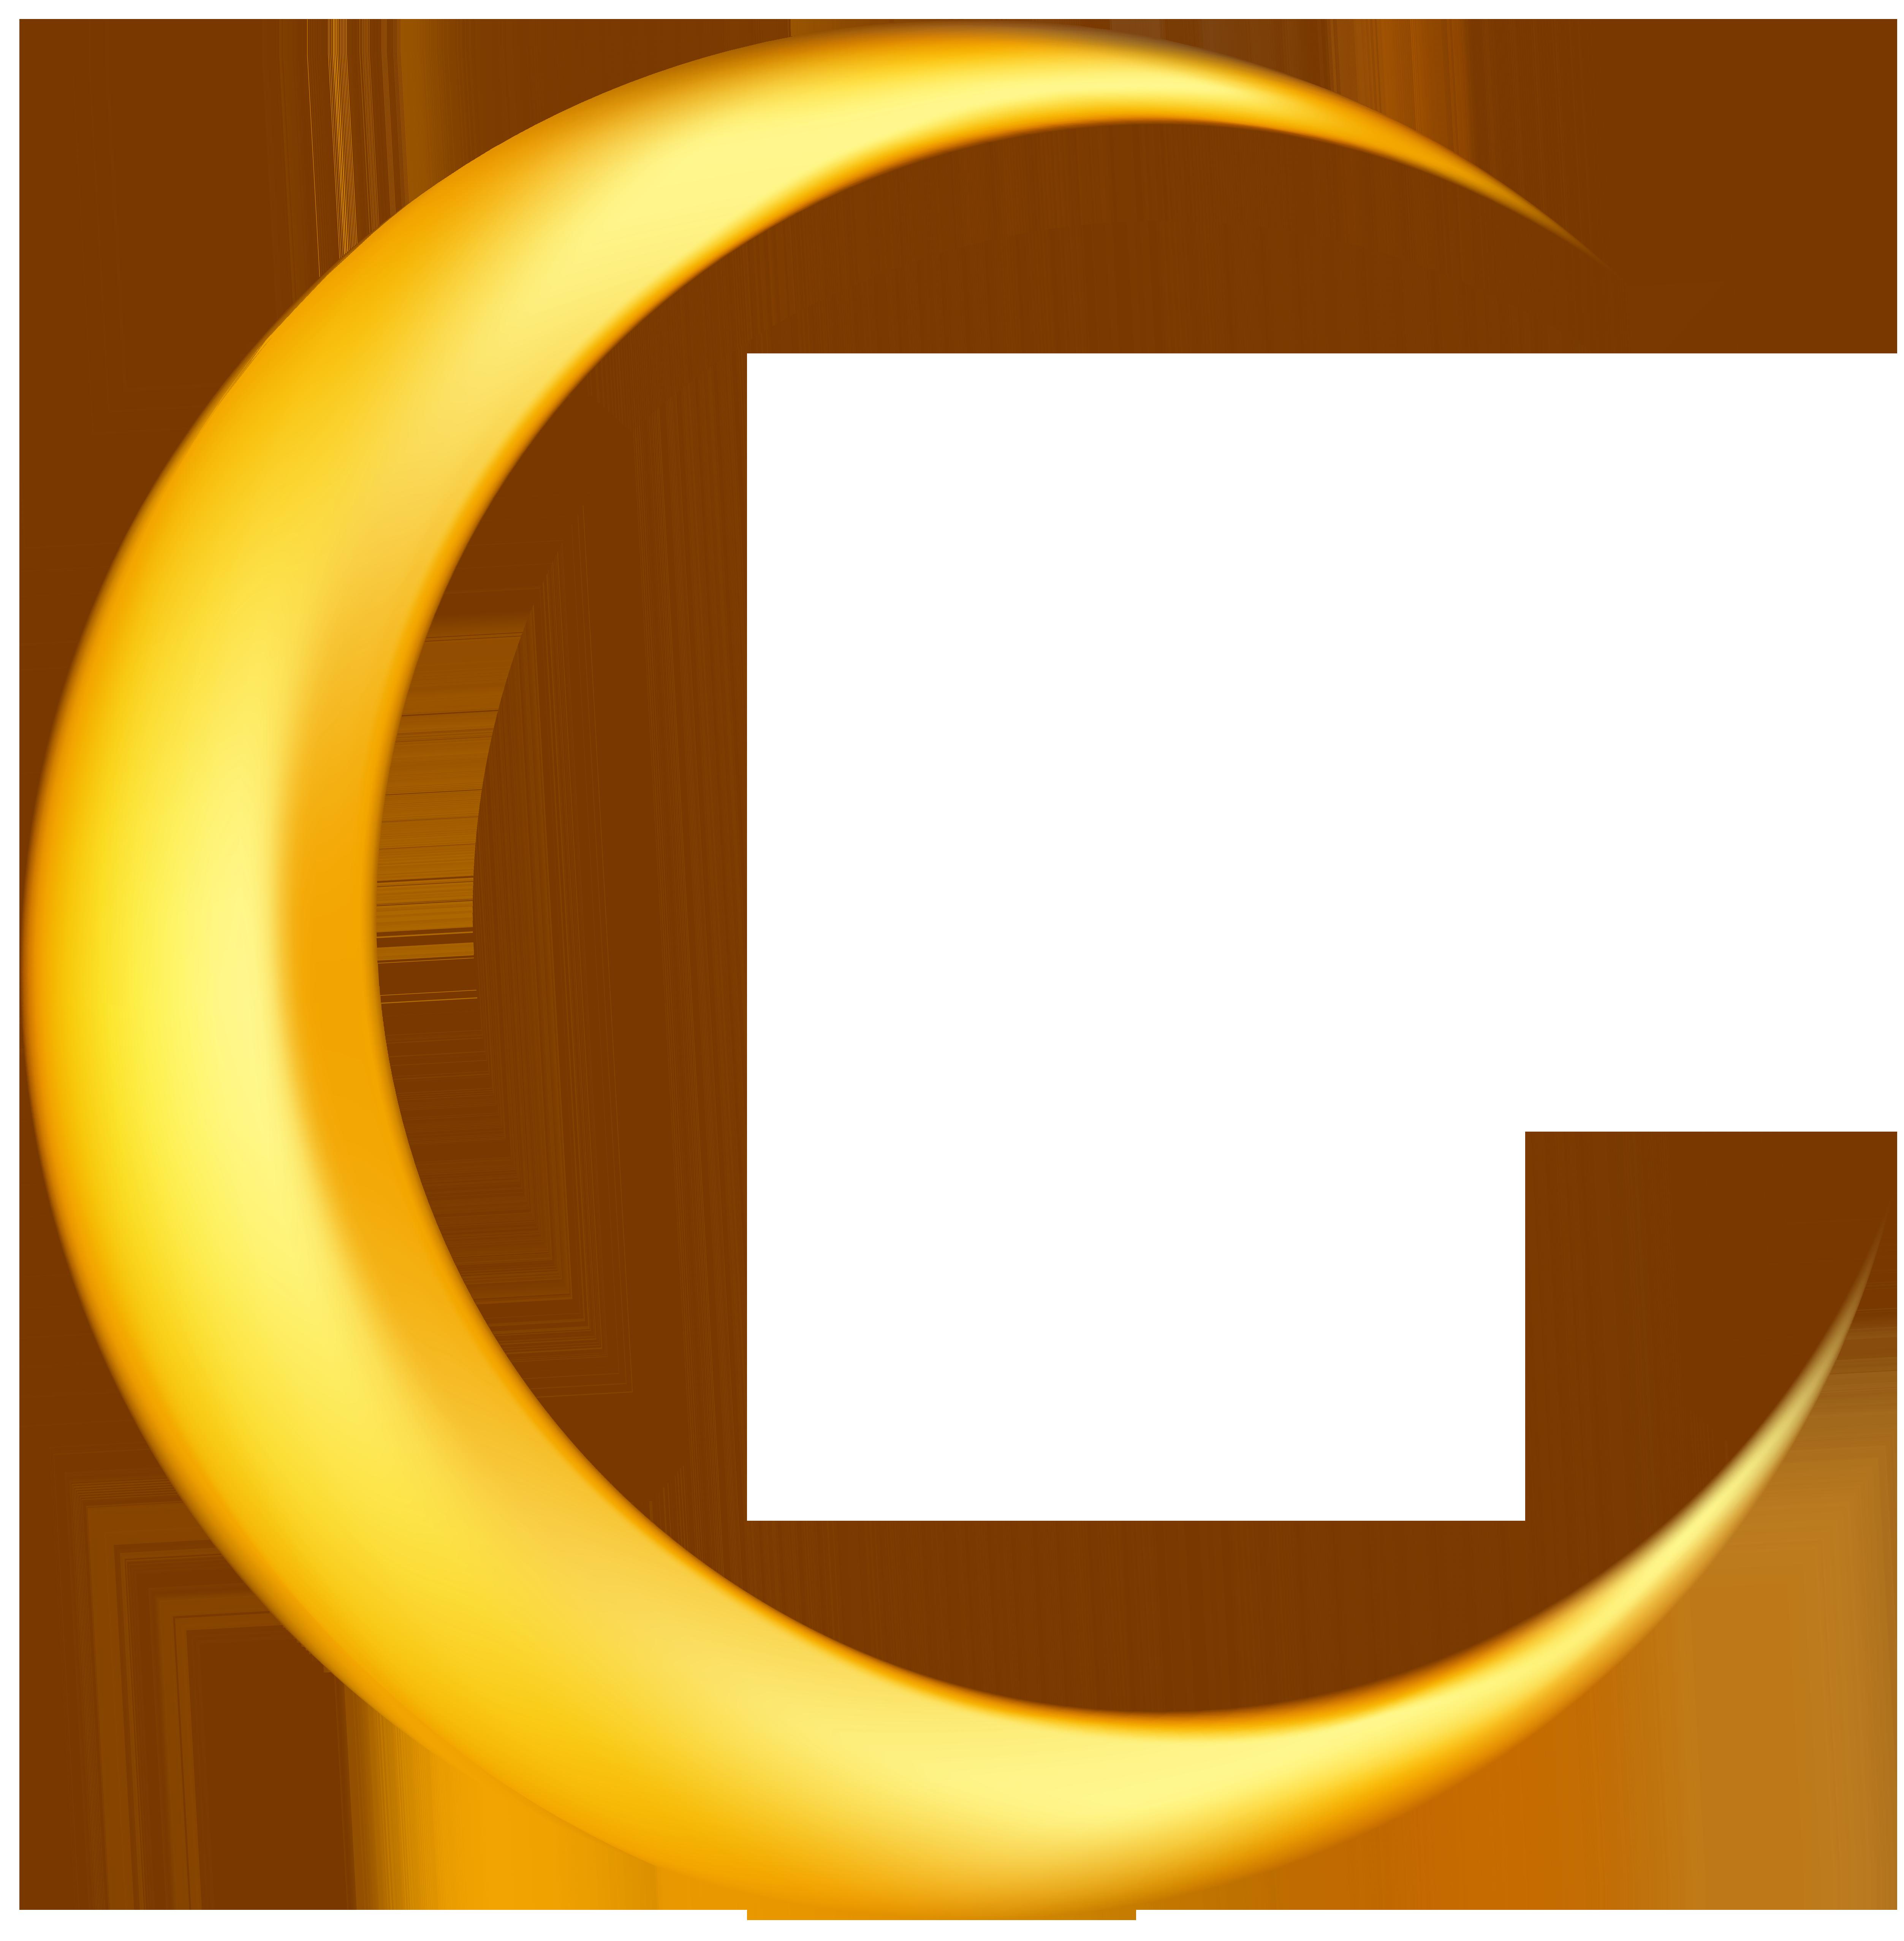 Moon Clipart Moon Clipart-Moon Clipart Moon Clipart-18